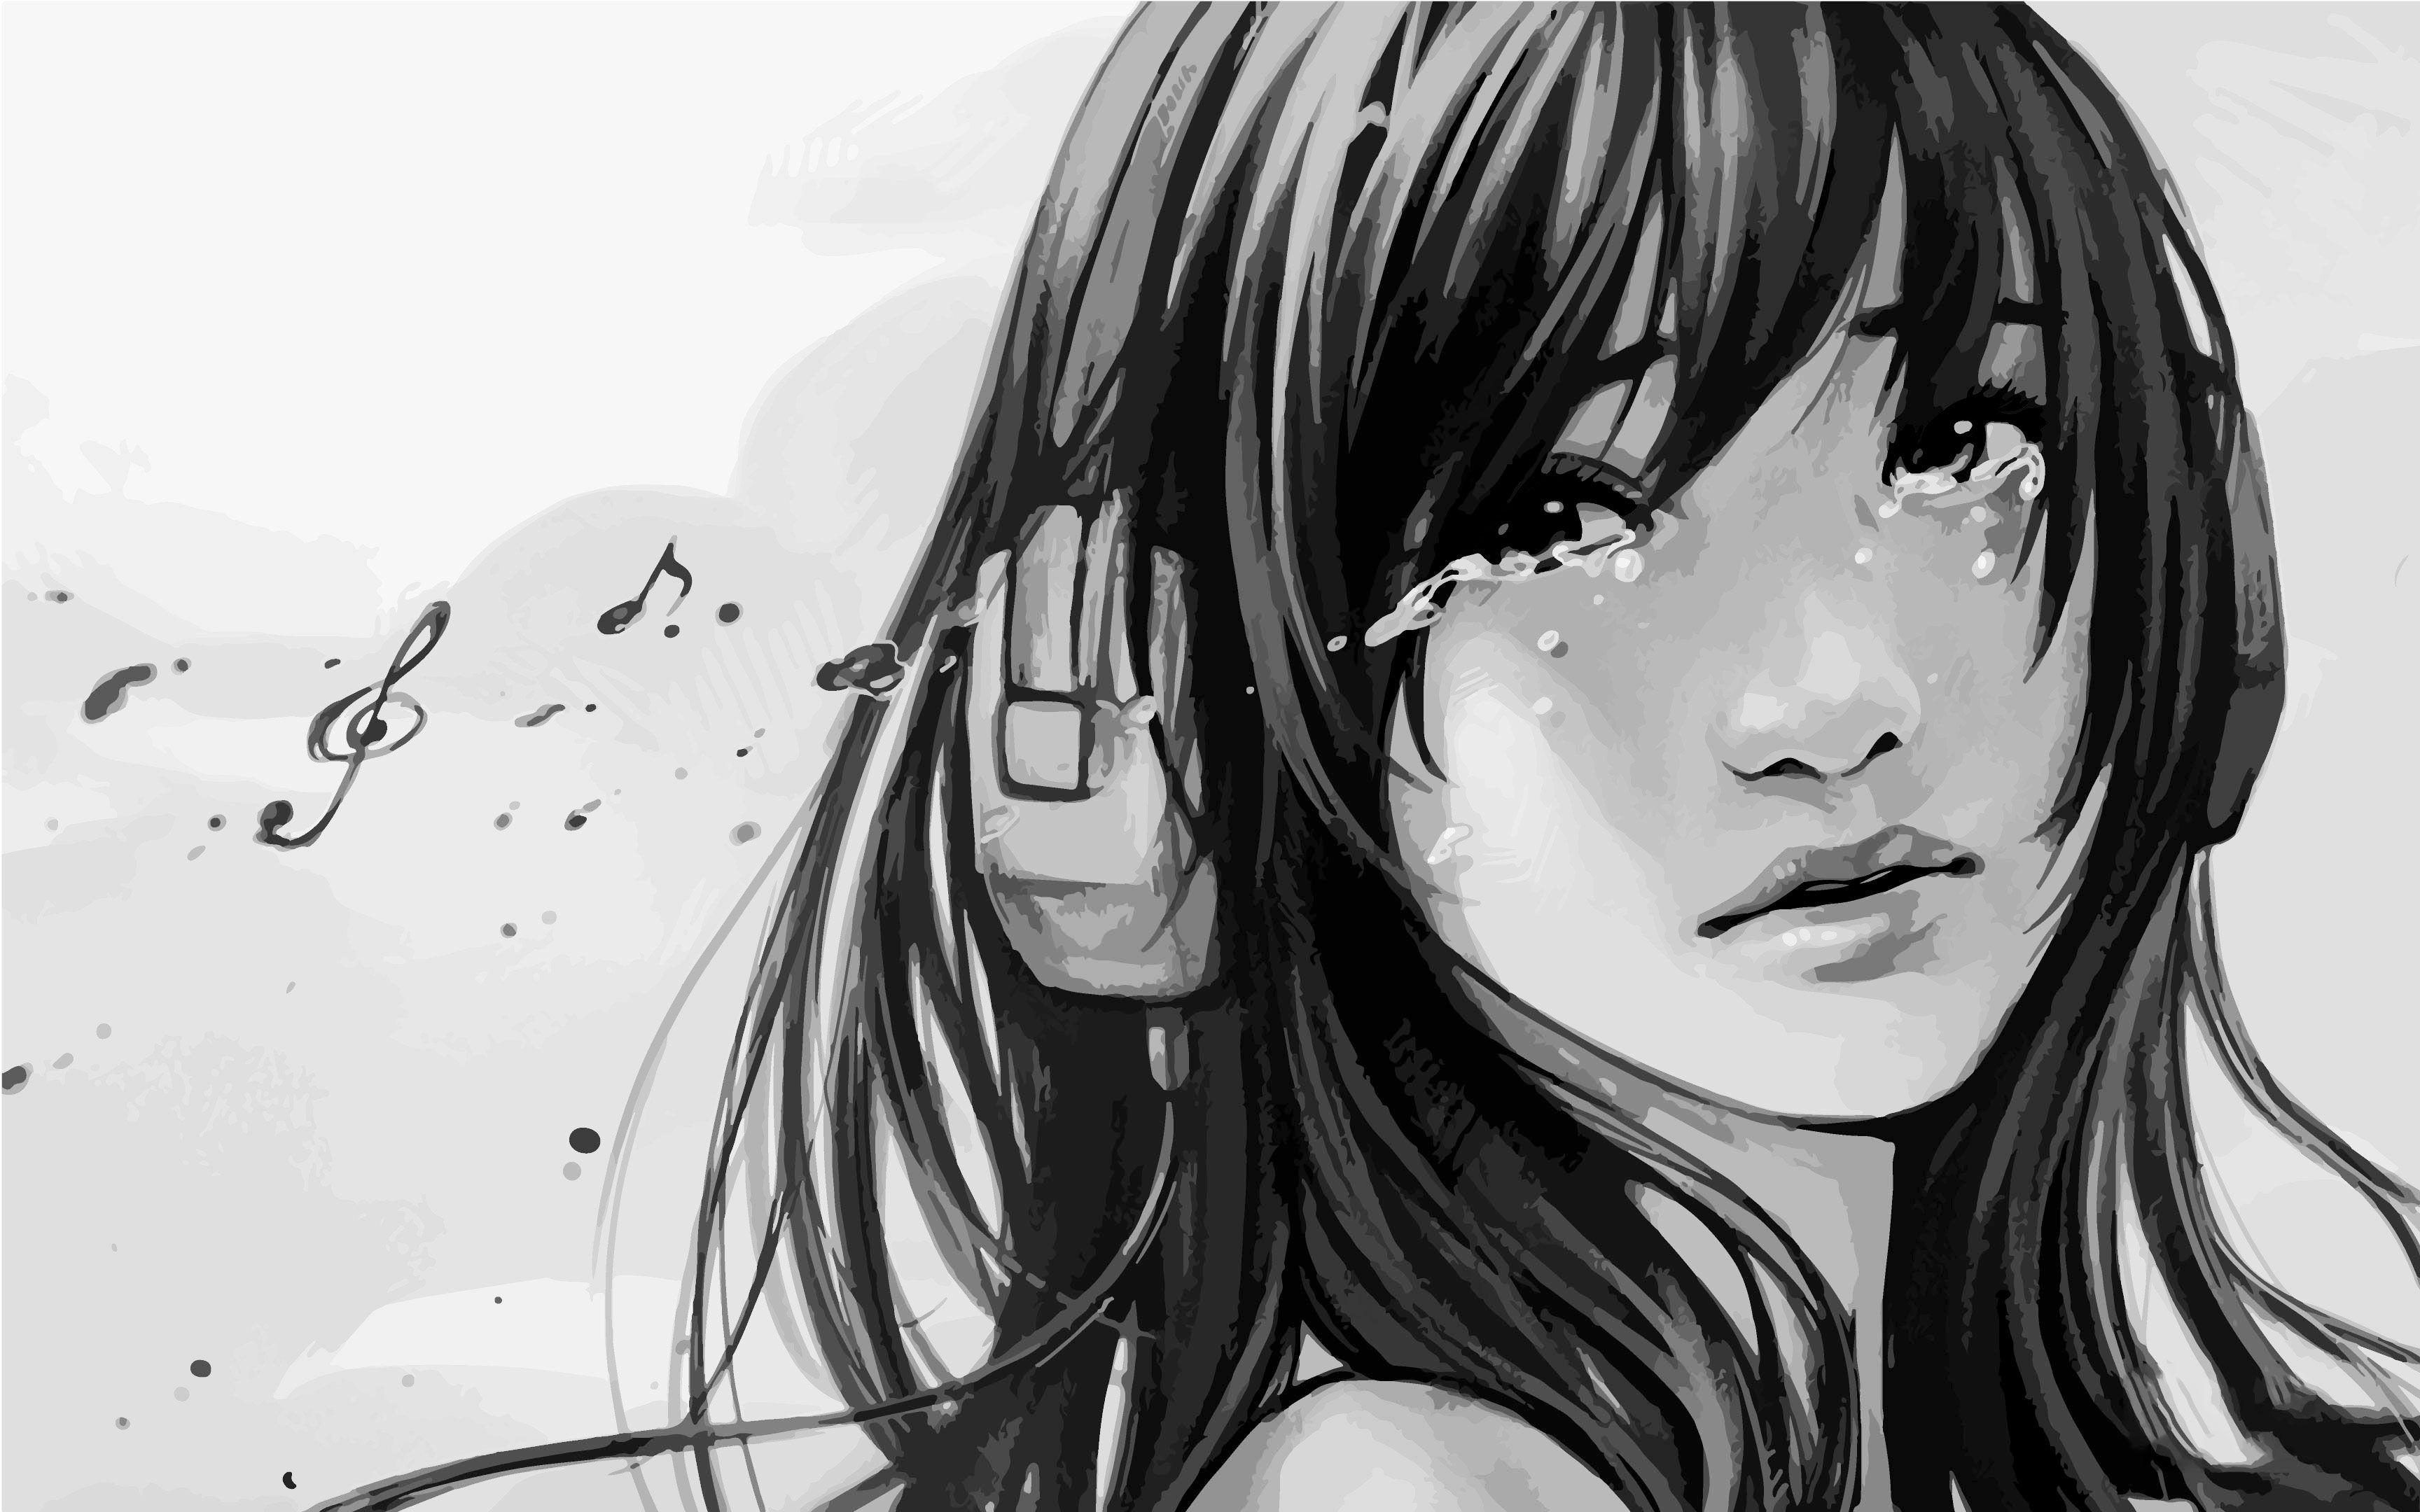 Anime Love Wallpaper Tumblr Sad Anime Girl Tumblr Gallery